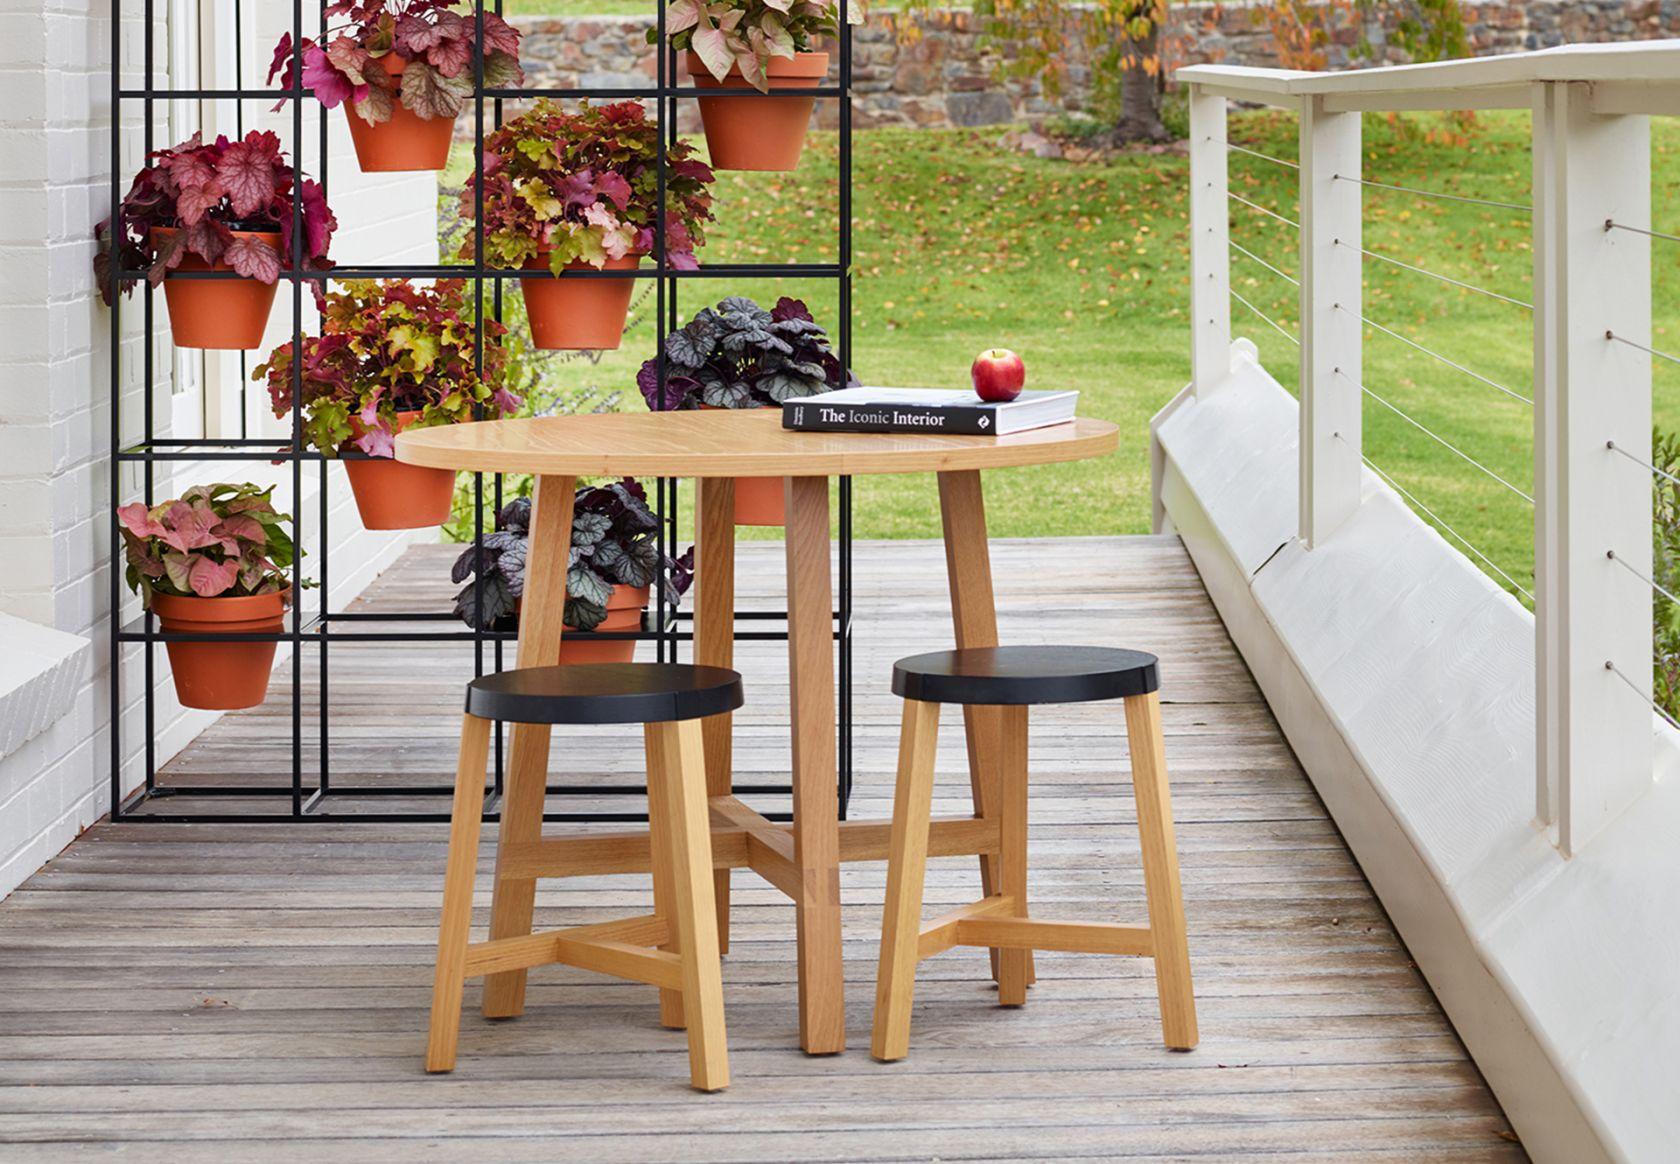 Toro Stool, Toro Table and Vertical Garden